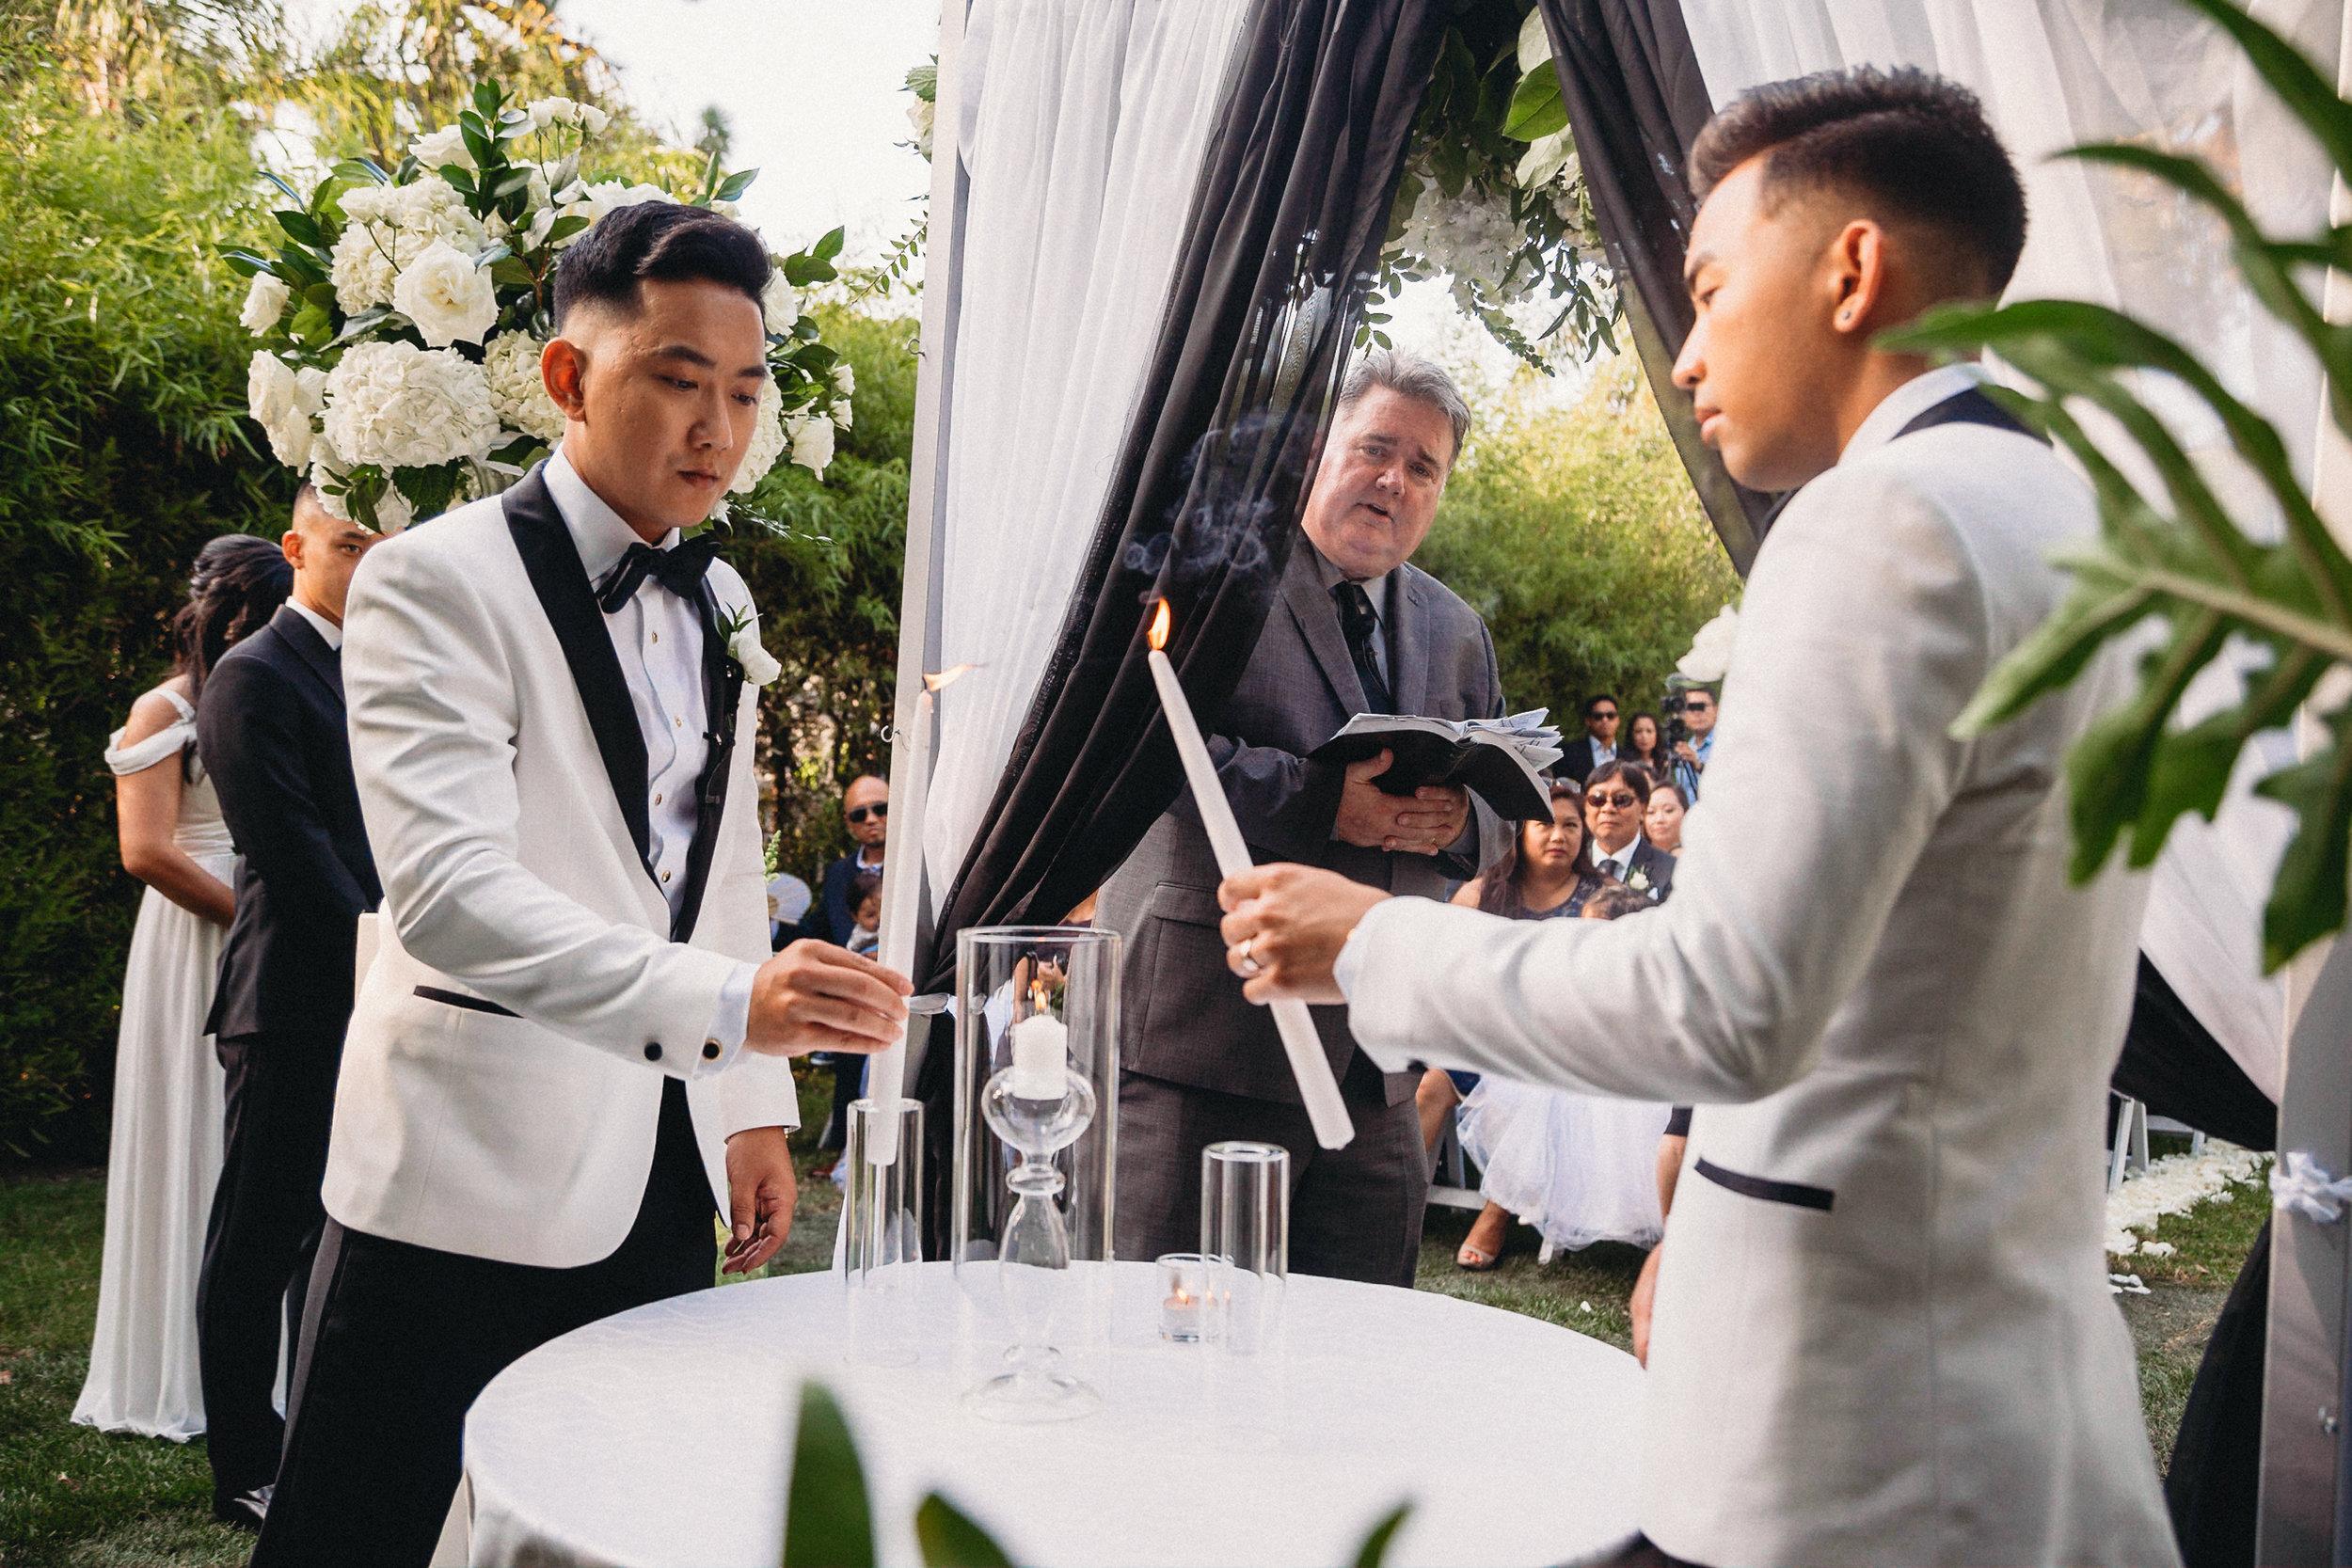 rebeccaylasotras-sandiego-lgbt-wedding-photography-52.jpg